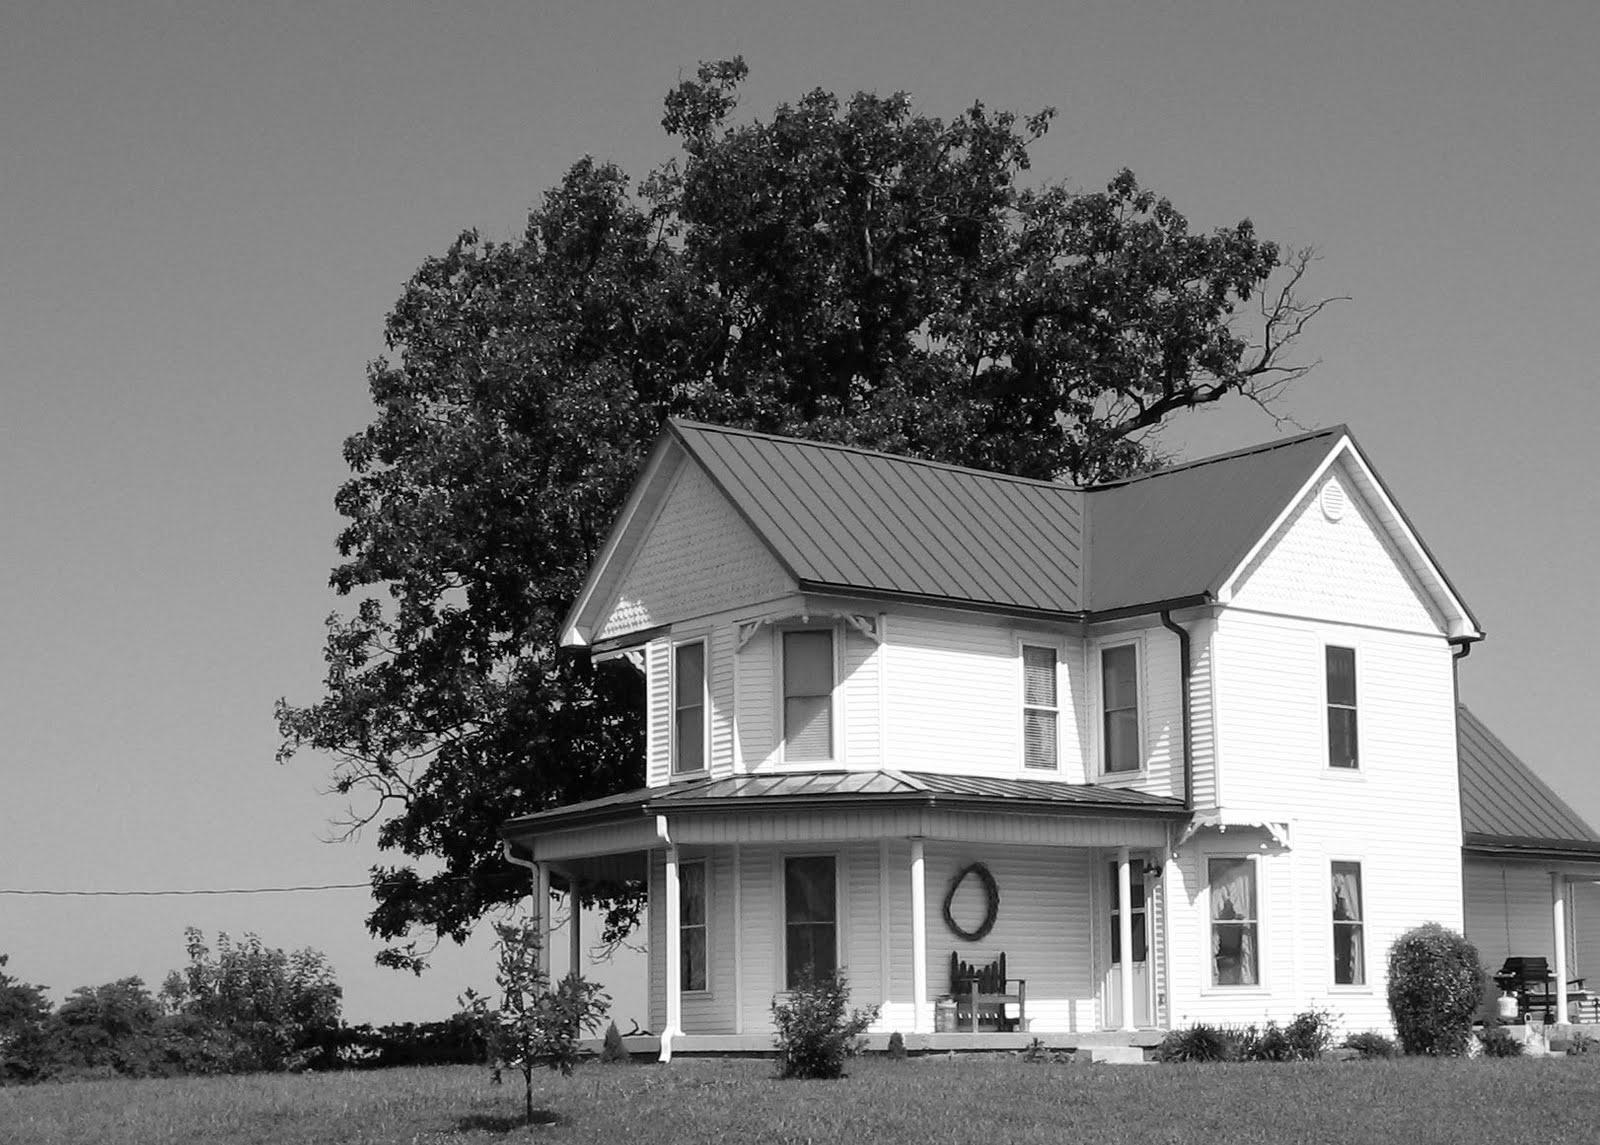 Feels Like Home to me The little white farmhouse